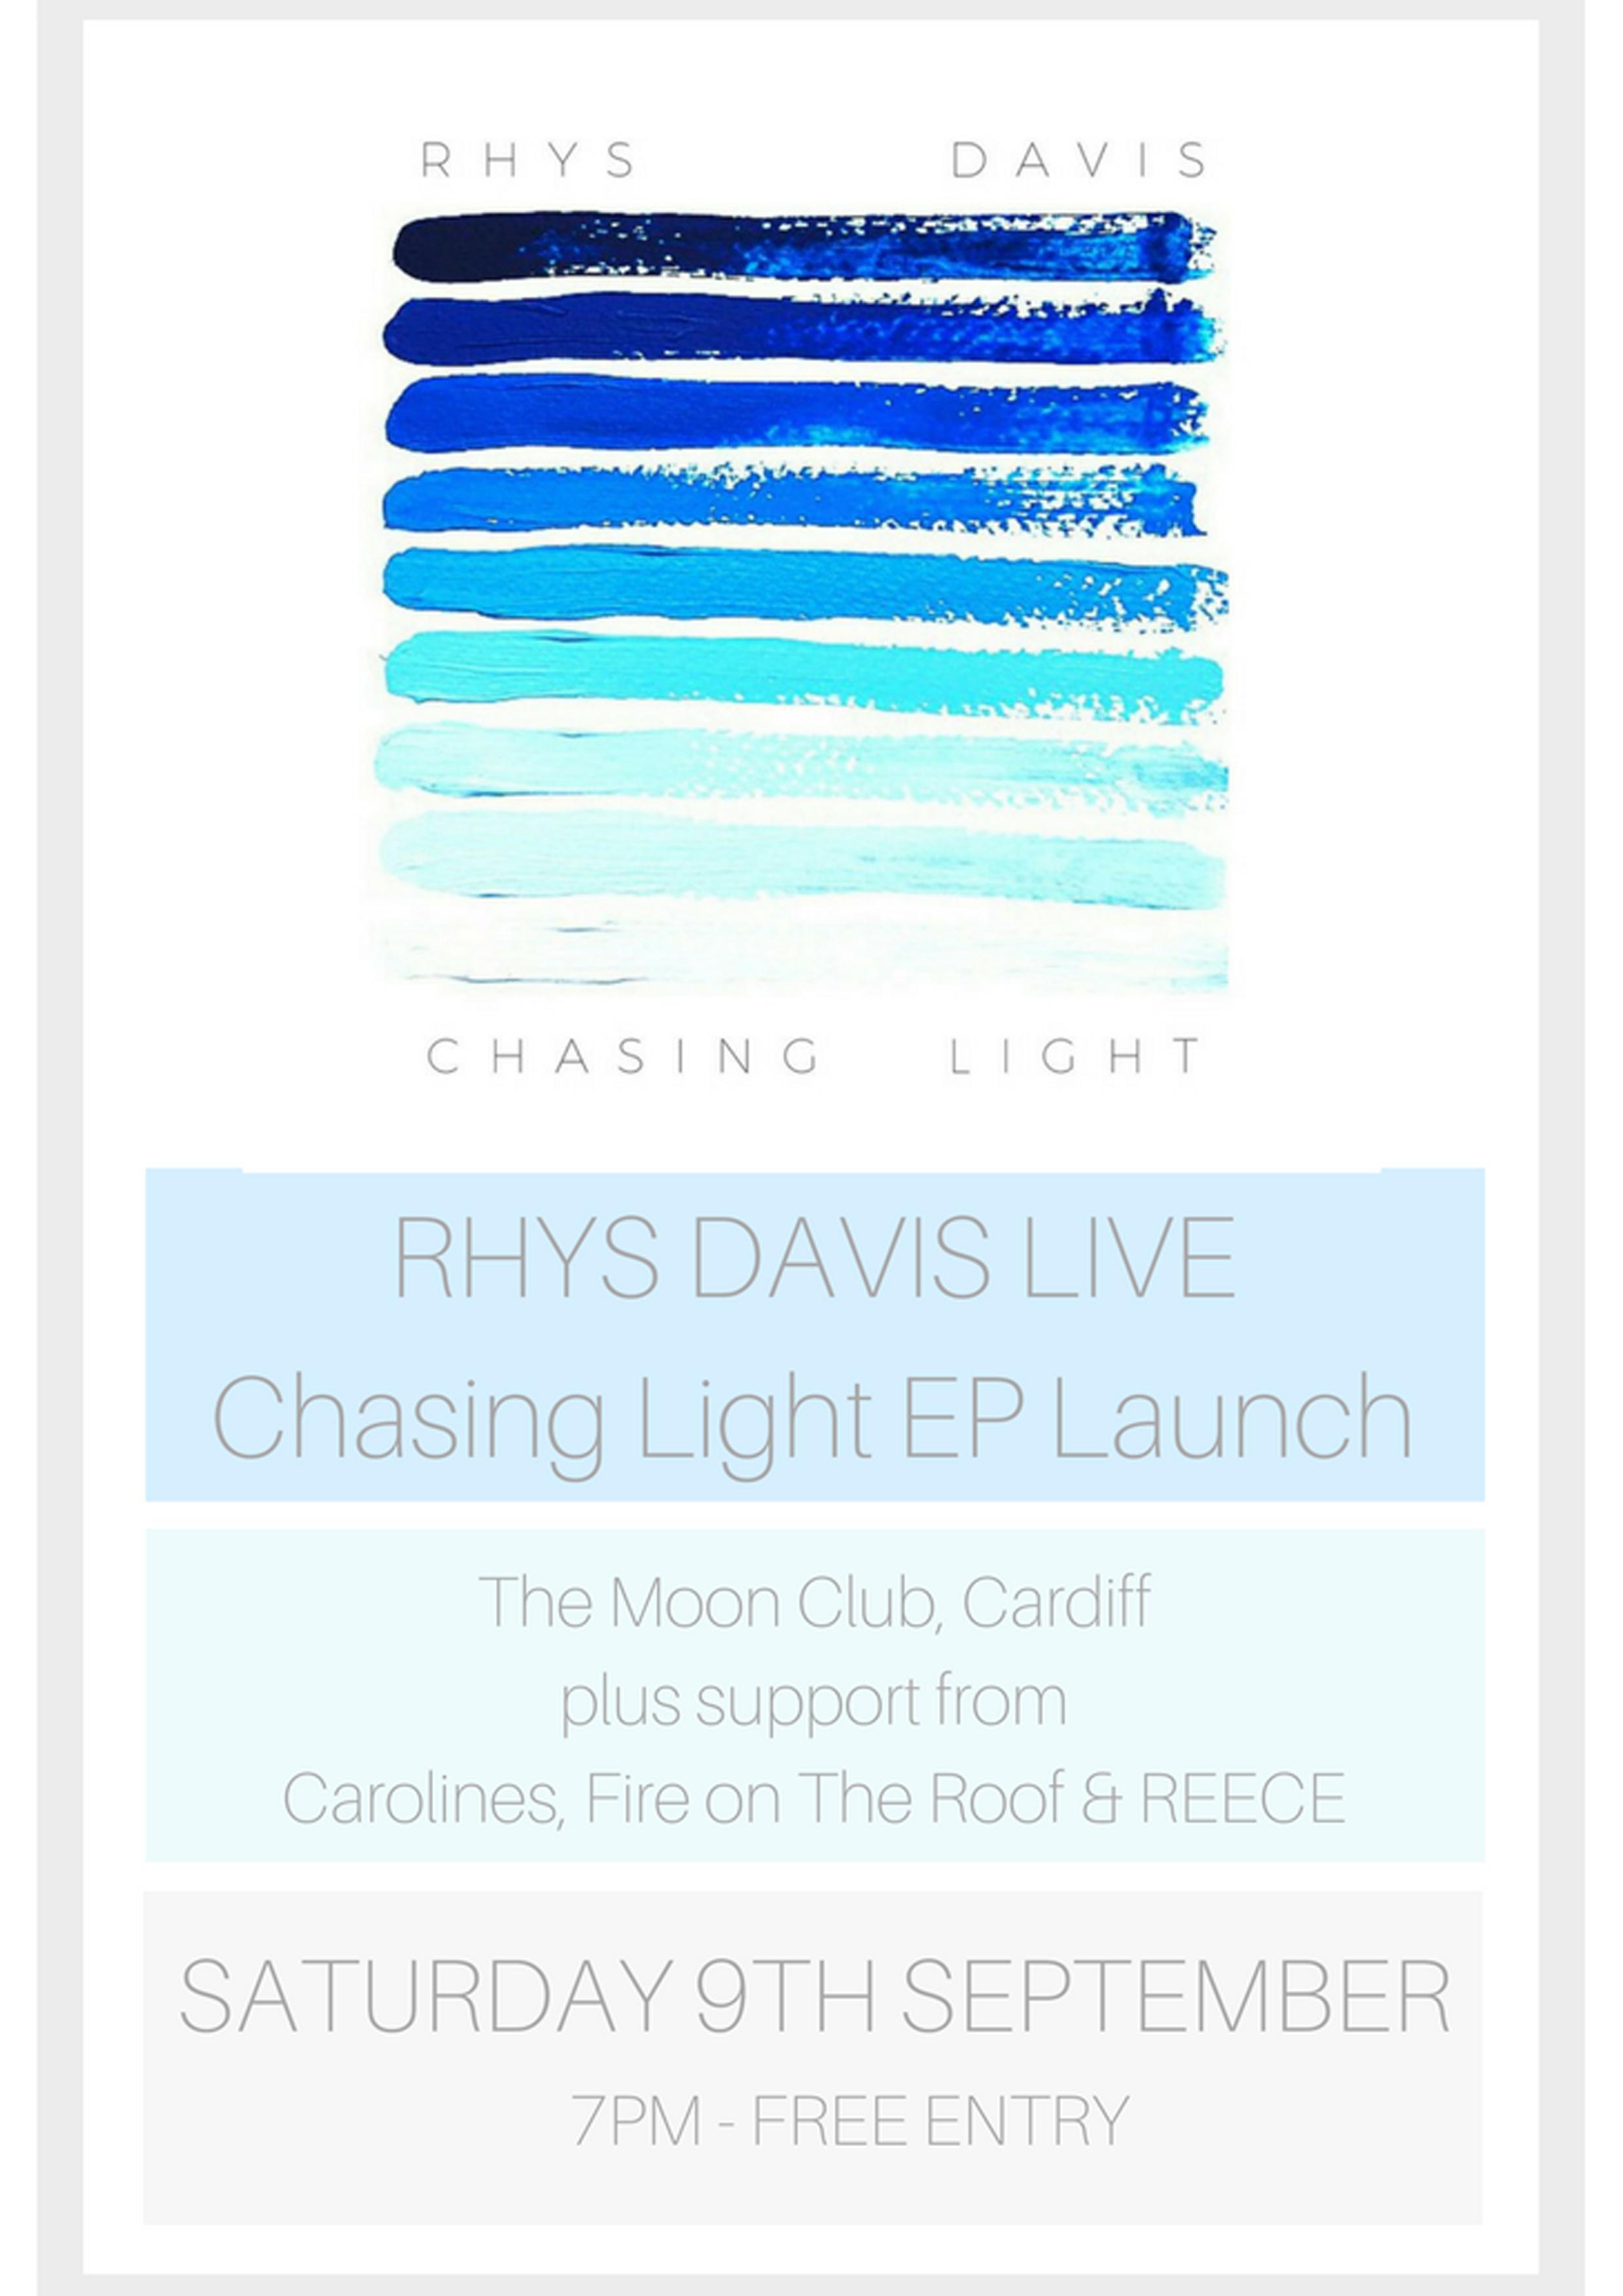 Rhys Davis Launch